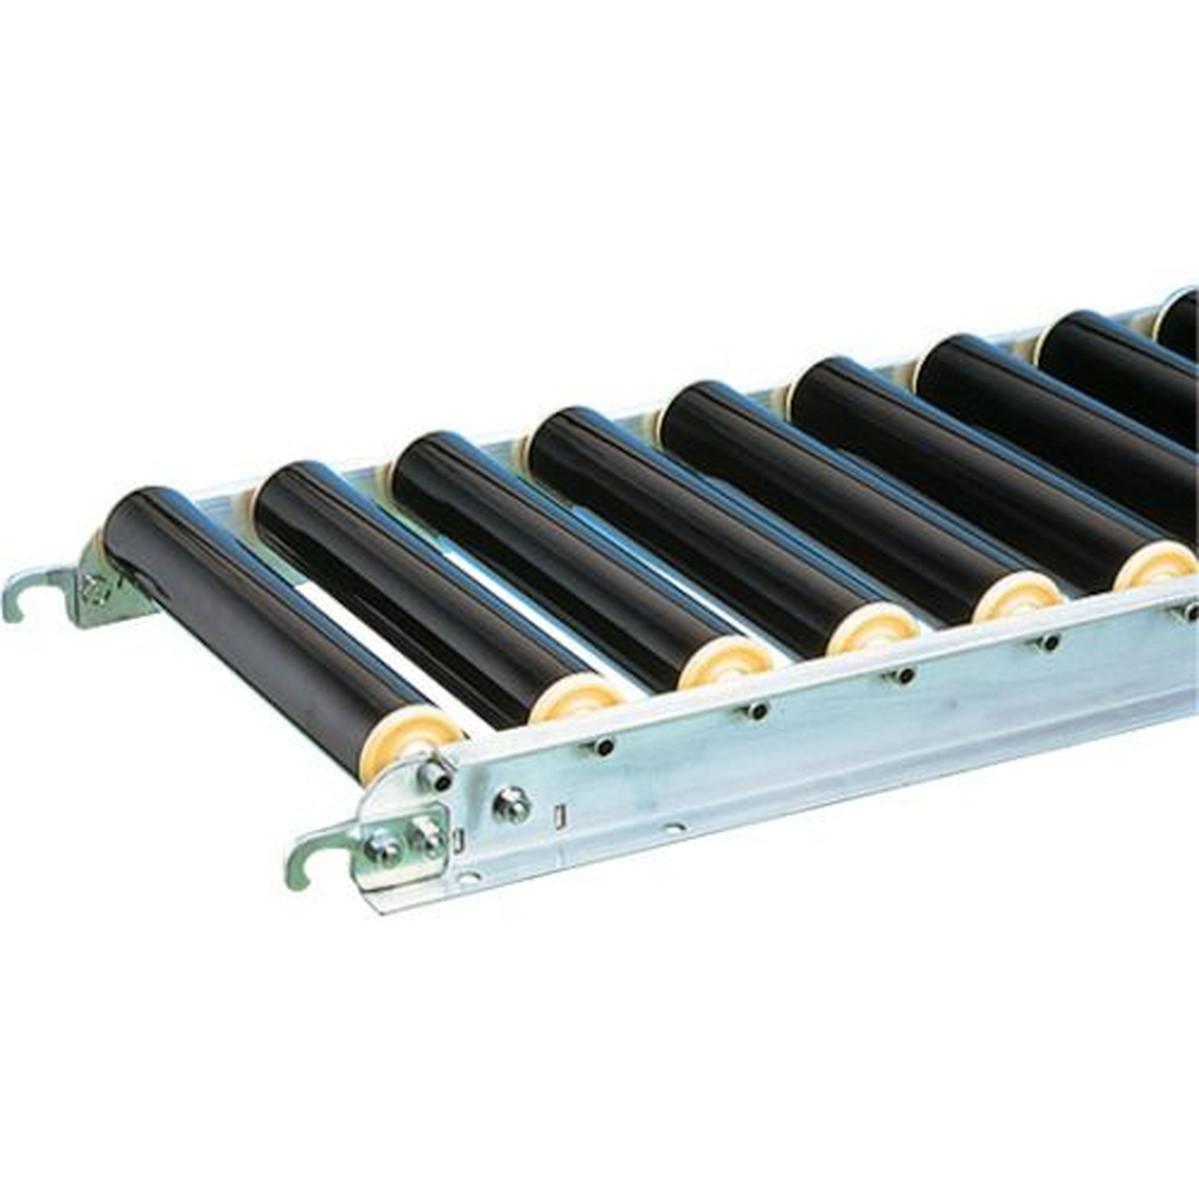 新品?正規品  三鈴 樹脂ローラコンベヤMR50B型Ф50X3.5T 幅500 3M 1台, タカチホチョウ 2cefa2da